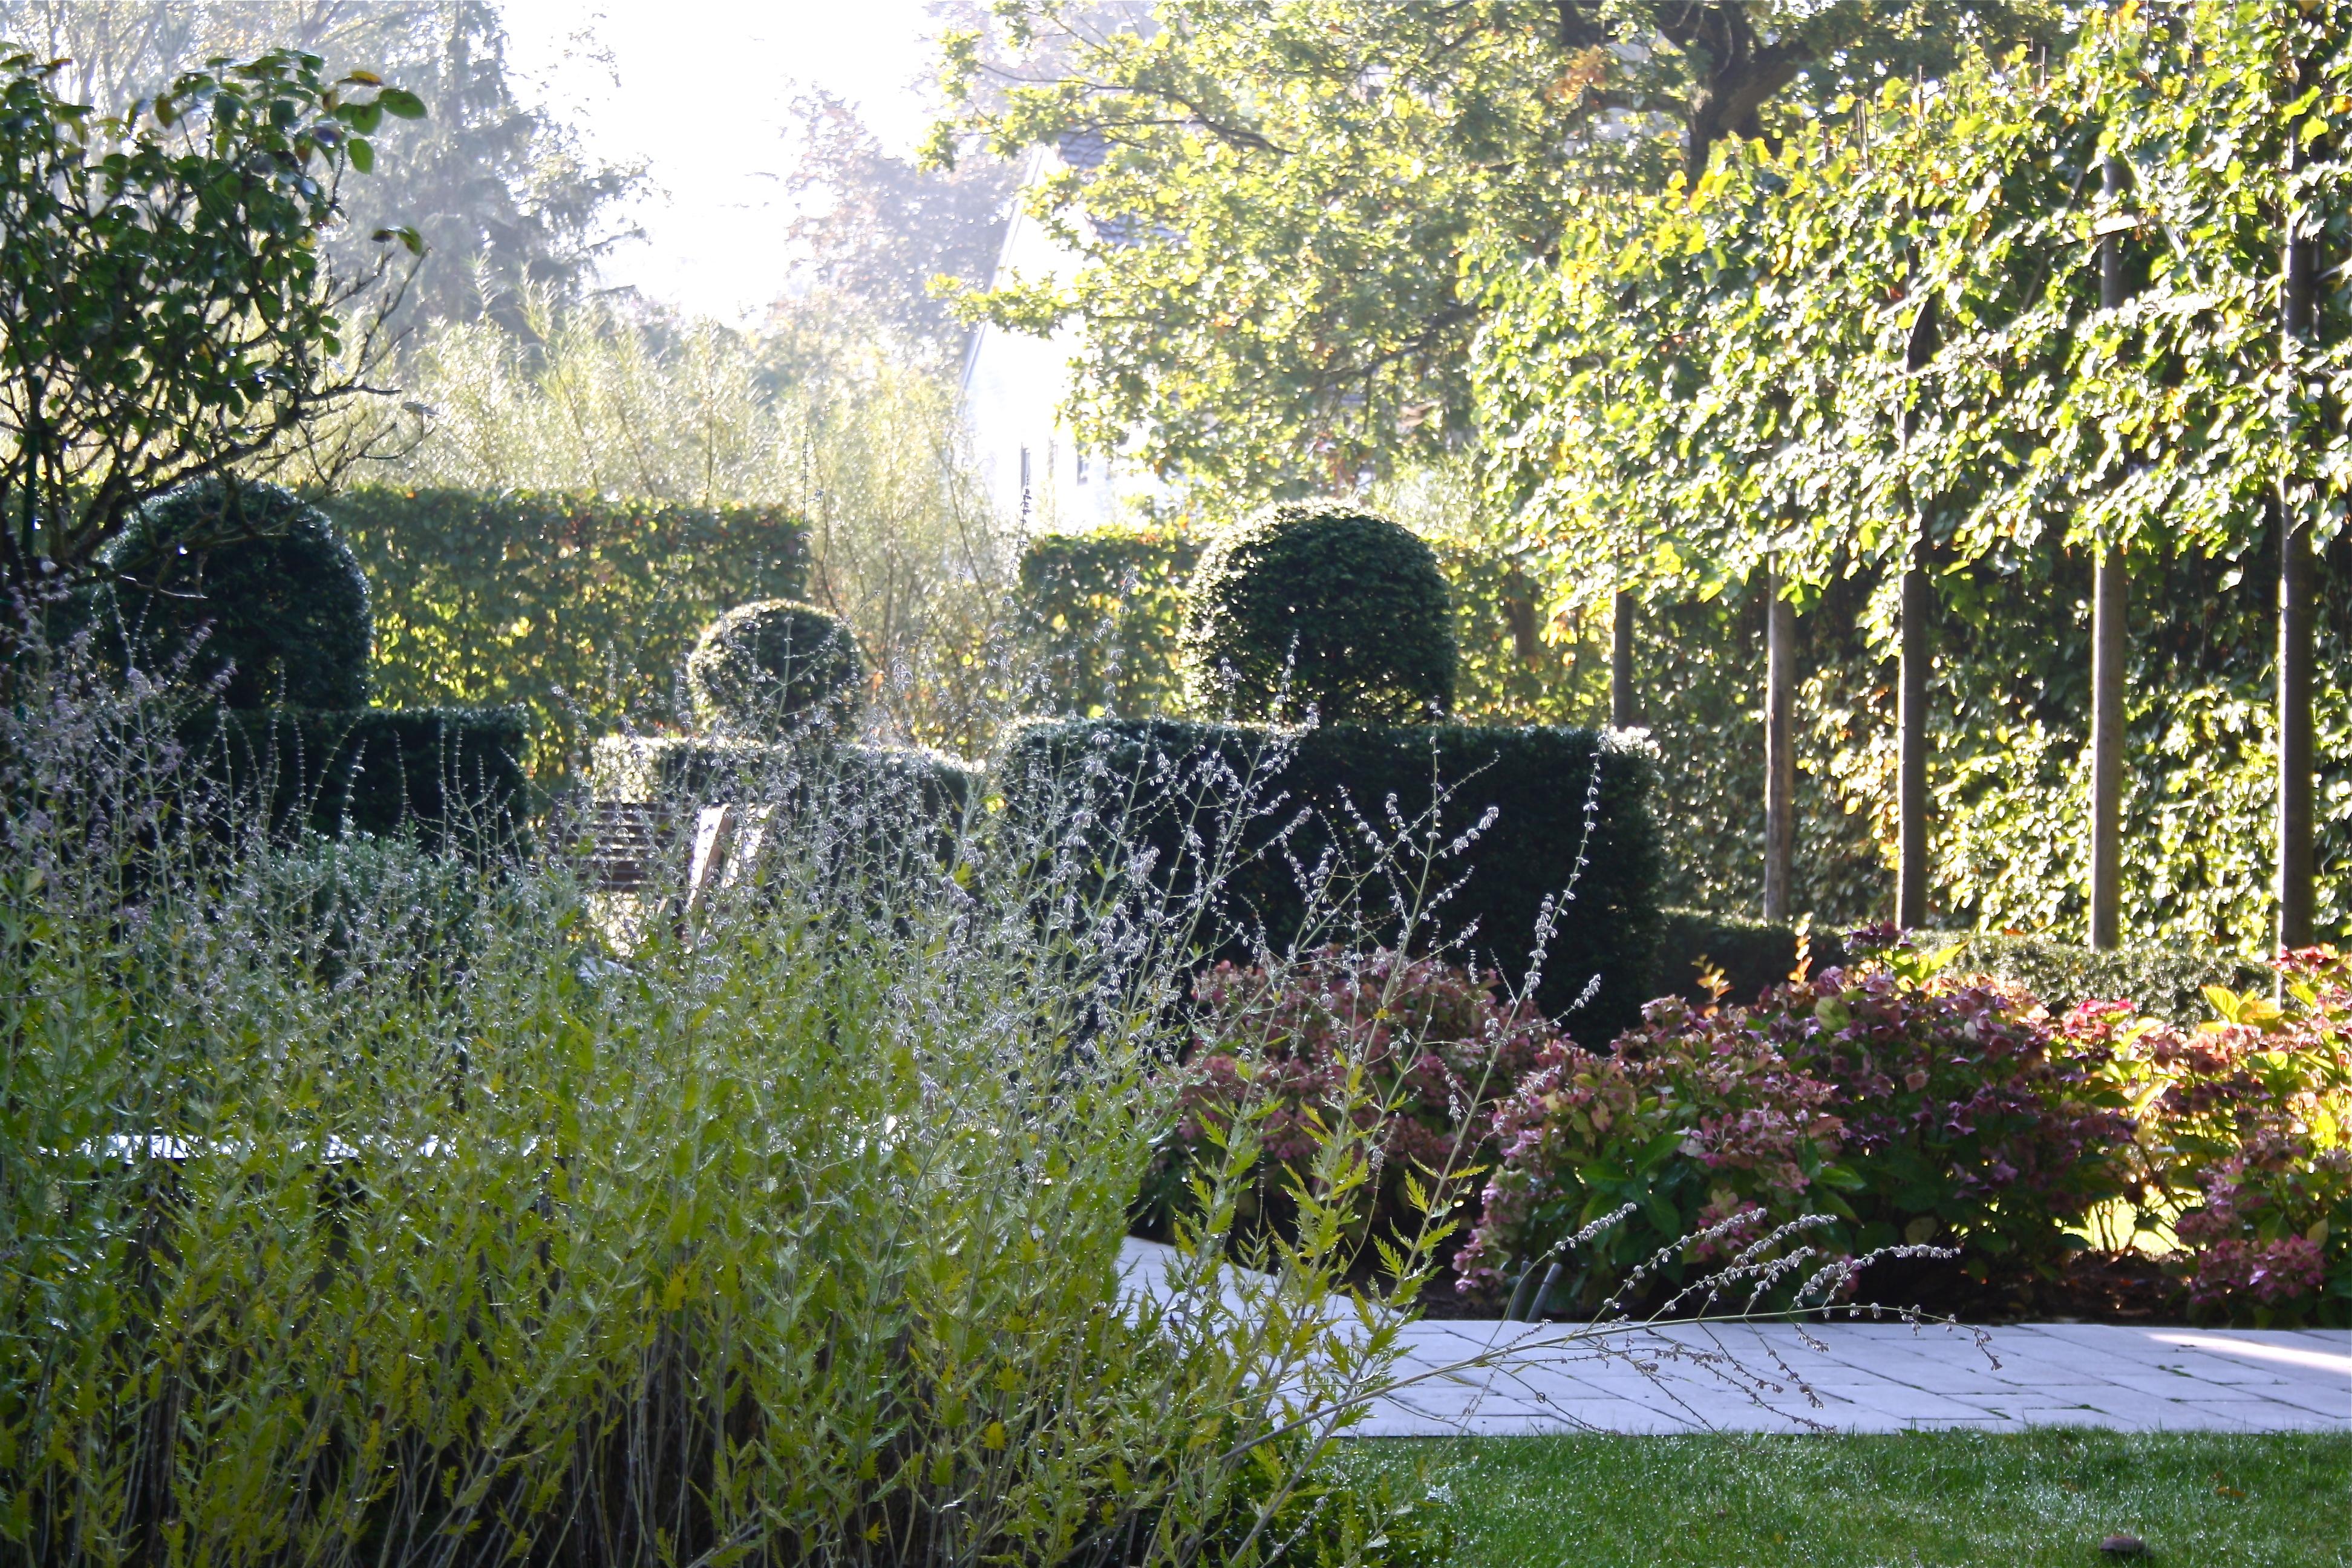 tranquillit art landscape architecte paysagiste architecte de jardin. Black Bedroom Furniture Sets. Home Design Ideas